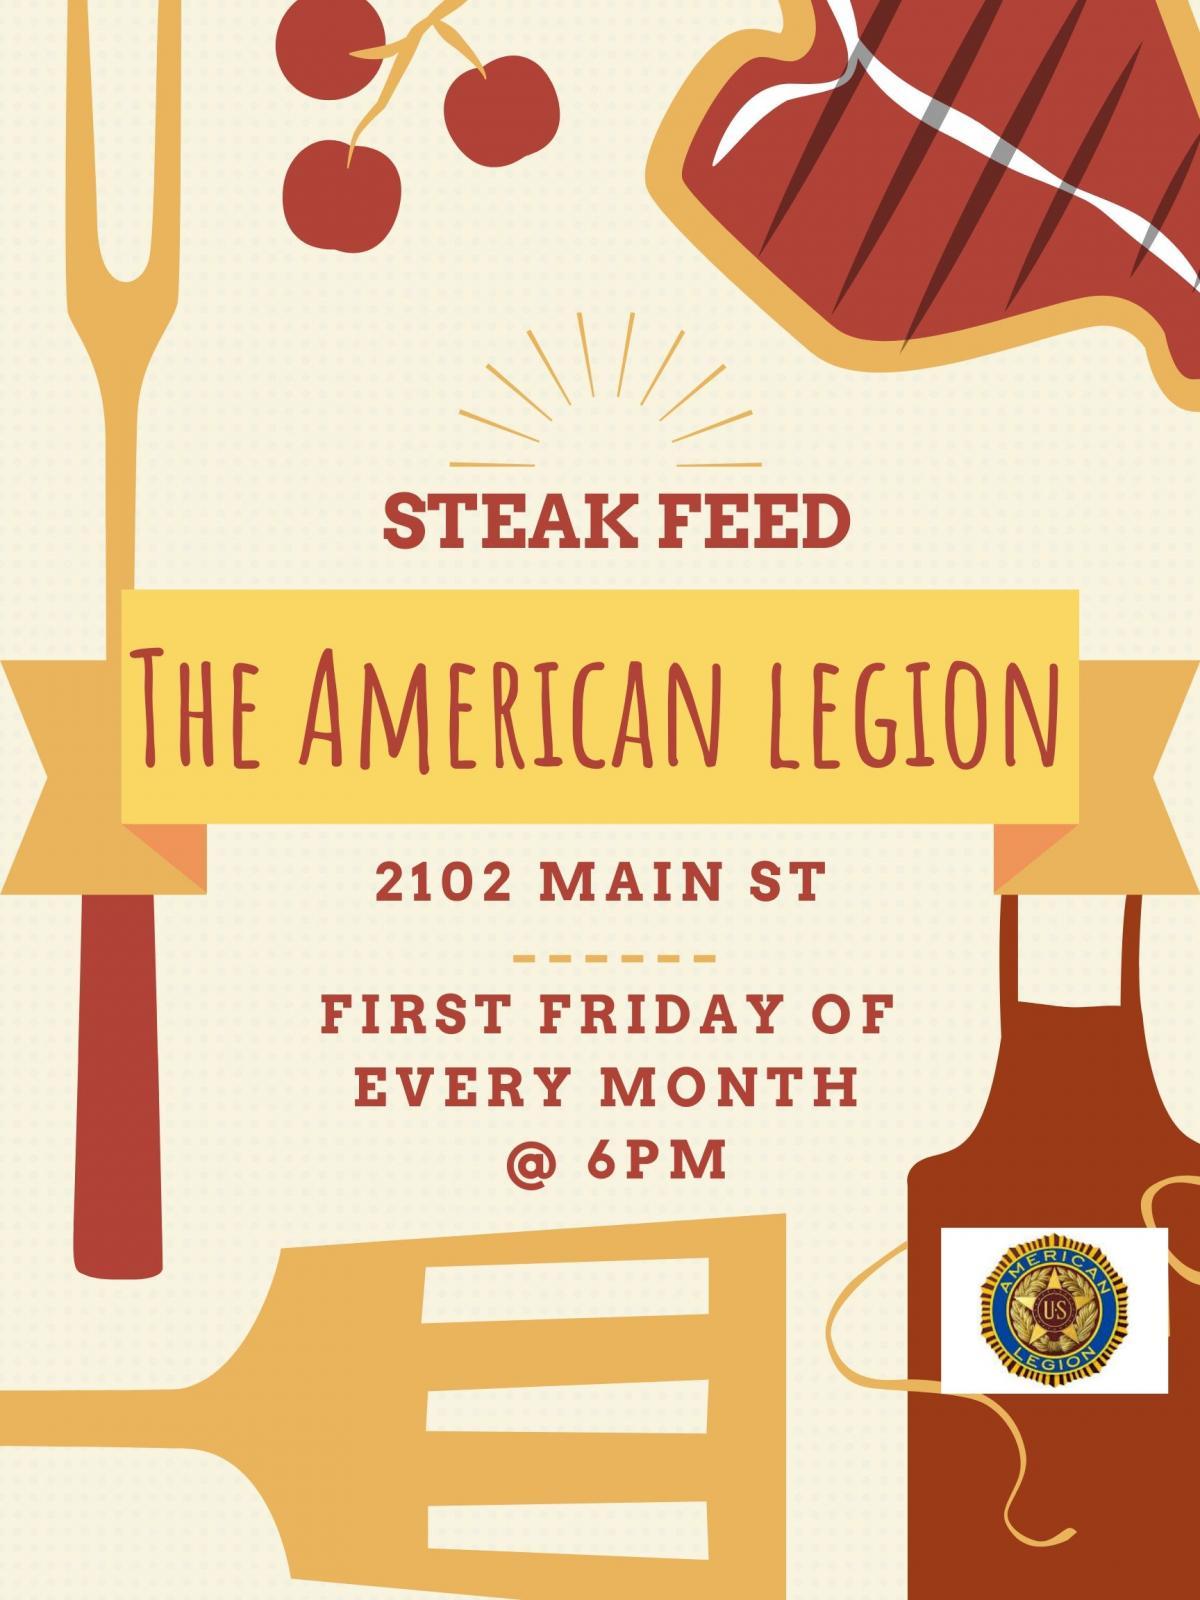 The American Legion Steak Feed Photo